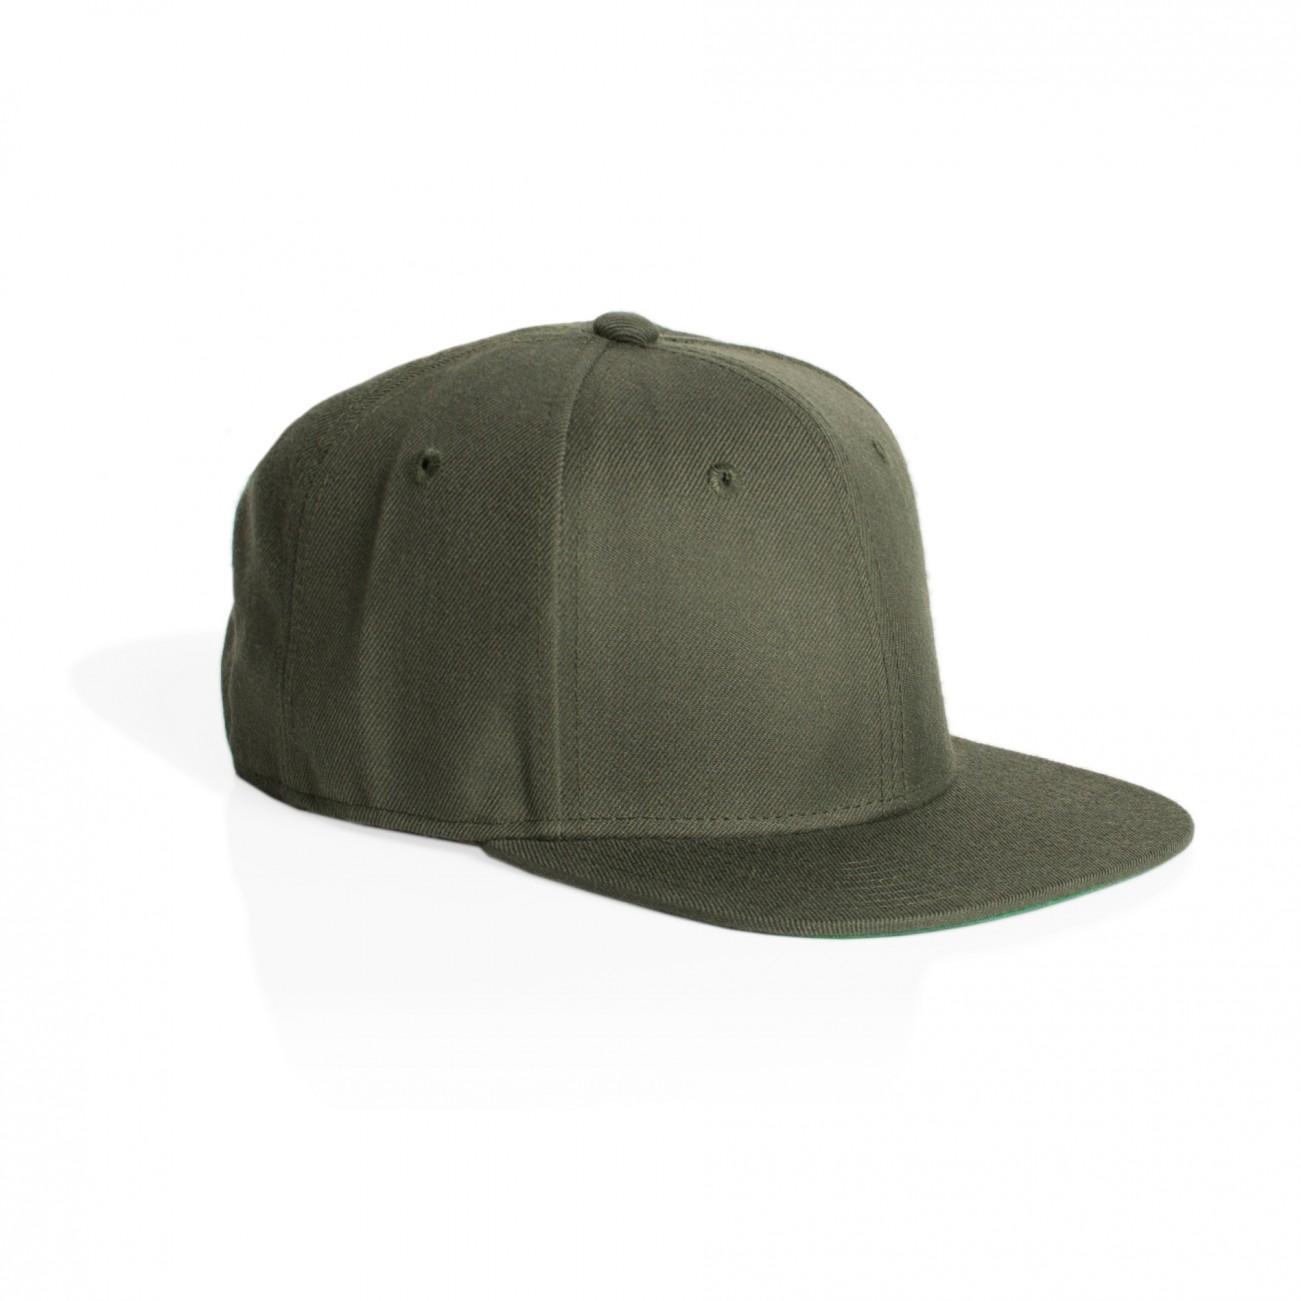 1101_trim_snapback_cap_army_2.jpg